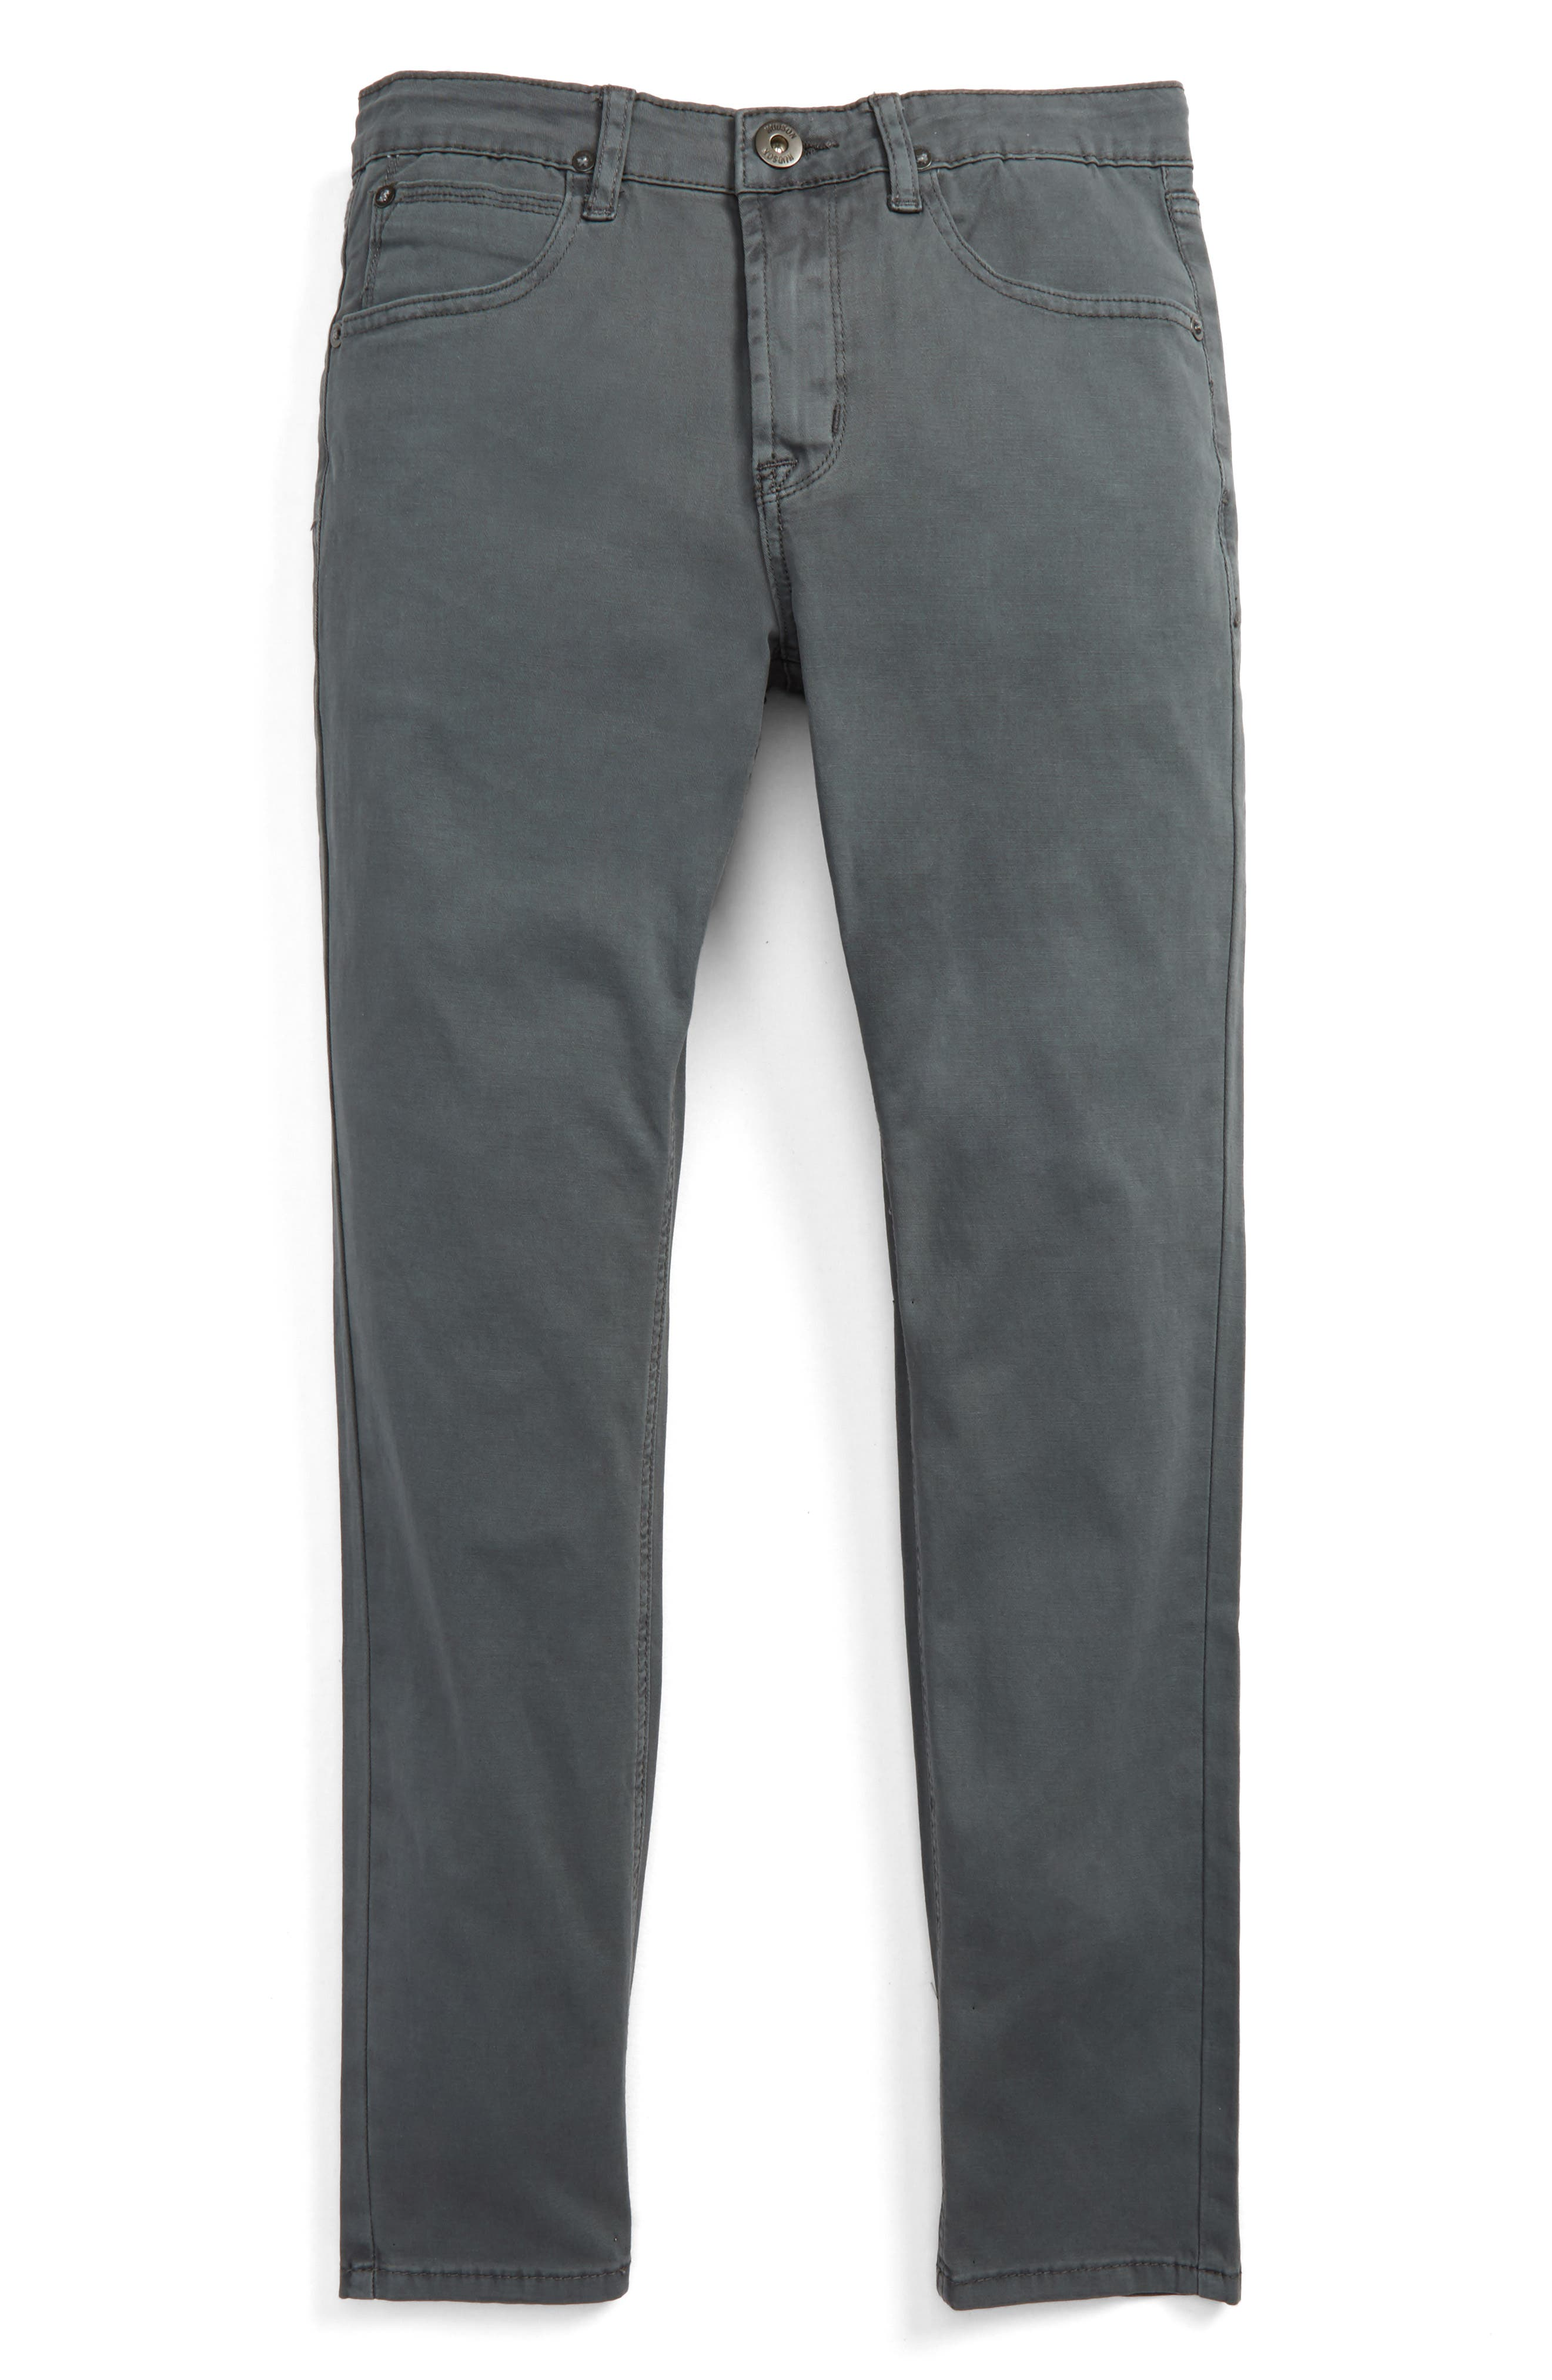 Alternate Image 1 Selected - Hudson Jeans Jagger Slim Fit Straight Leg Pants (Big Boys)